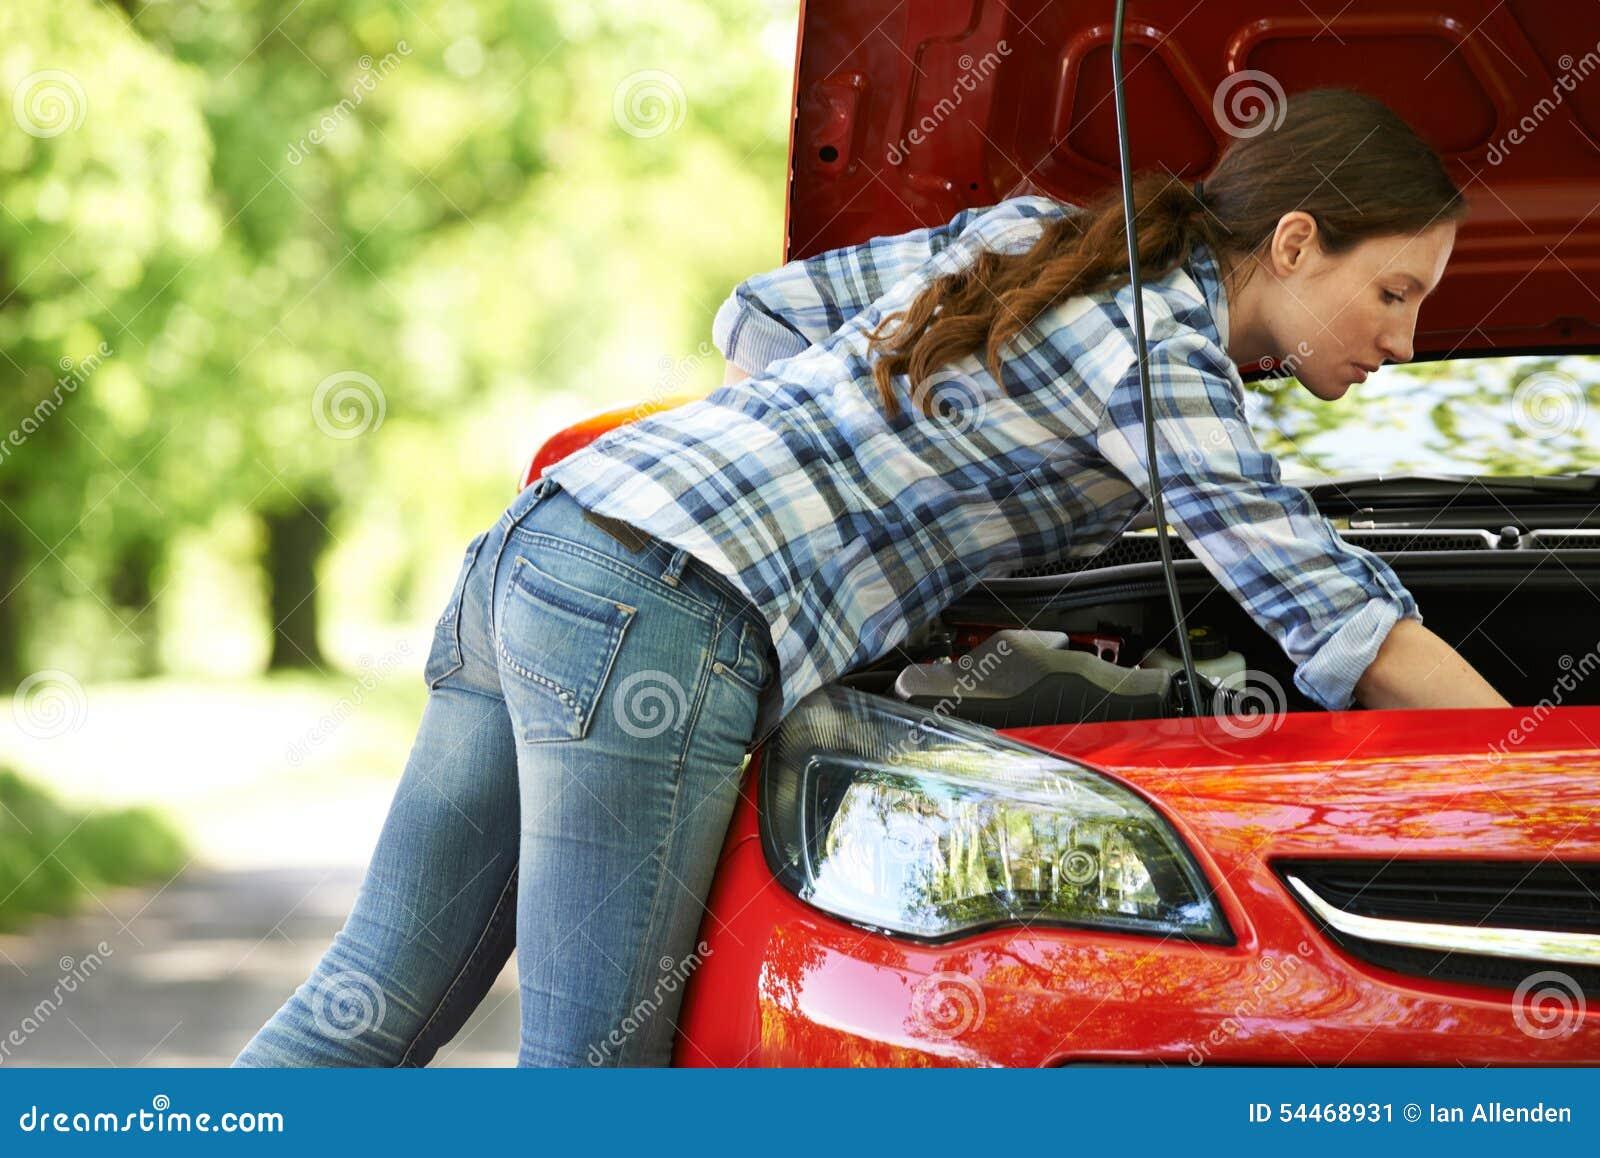 Conductor femenino analizado Looking Under Hood Of Car